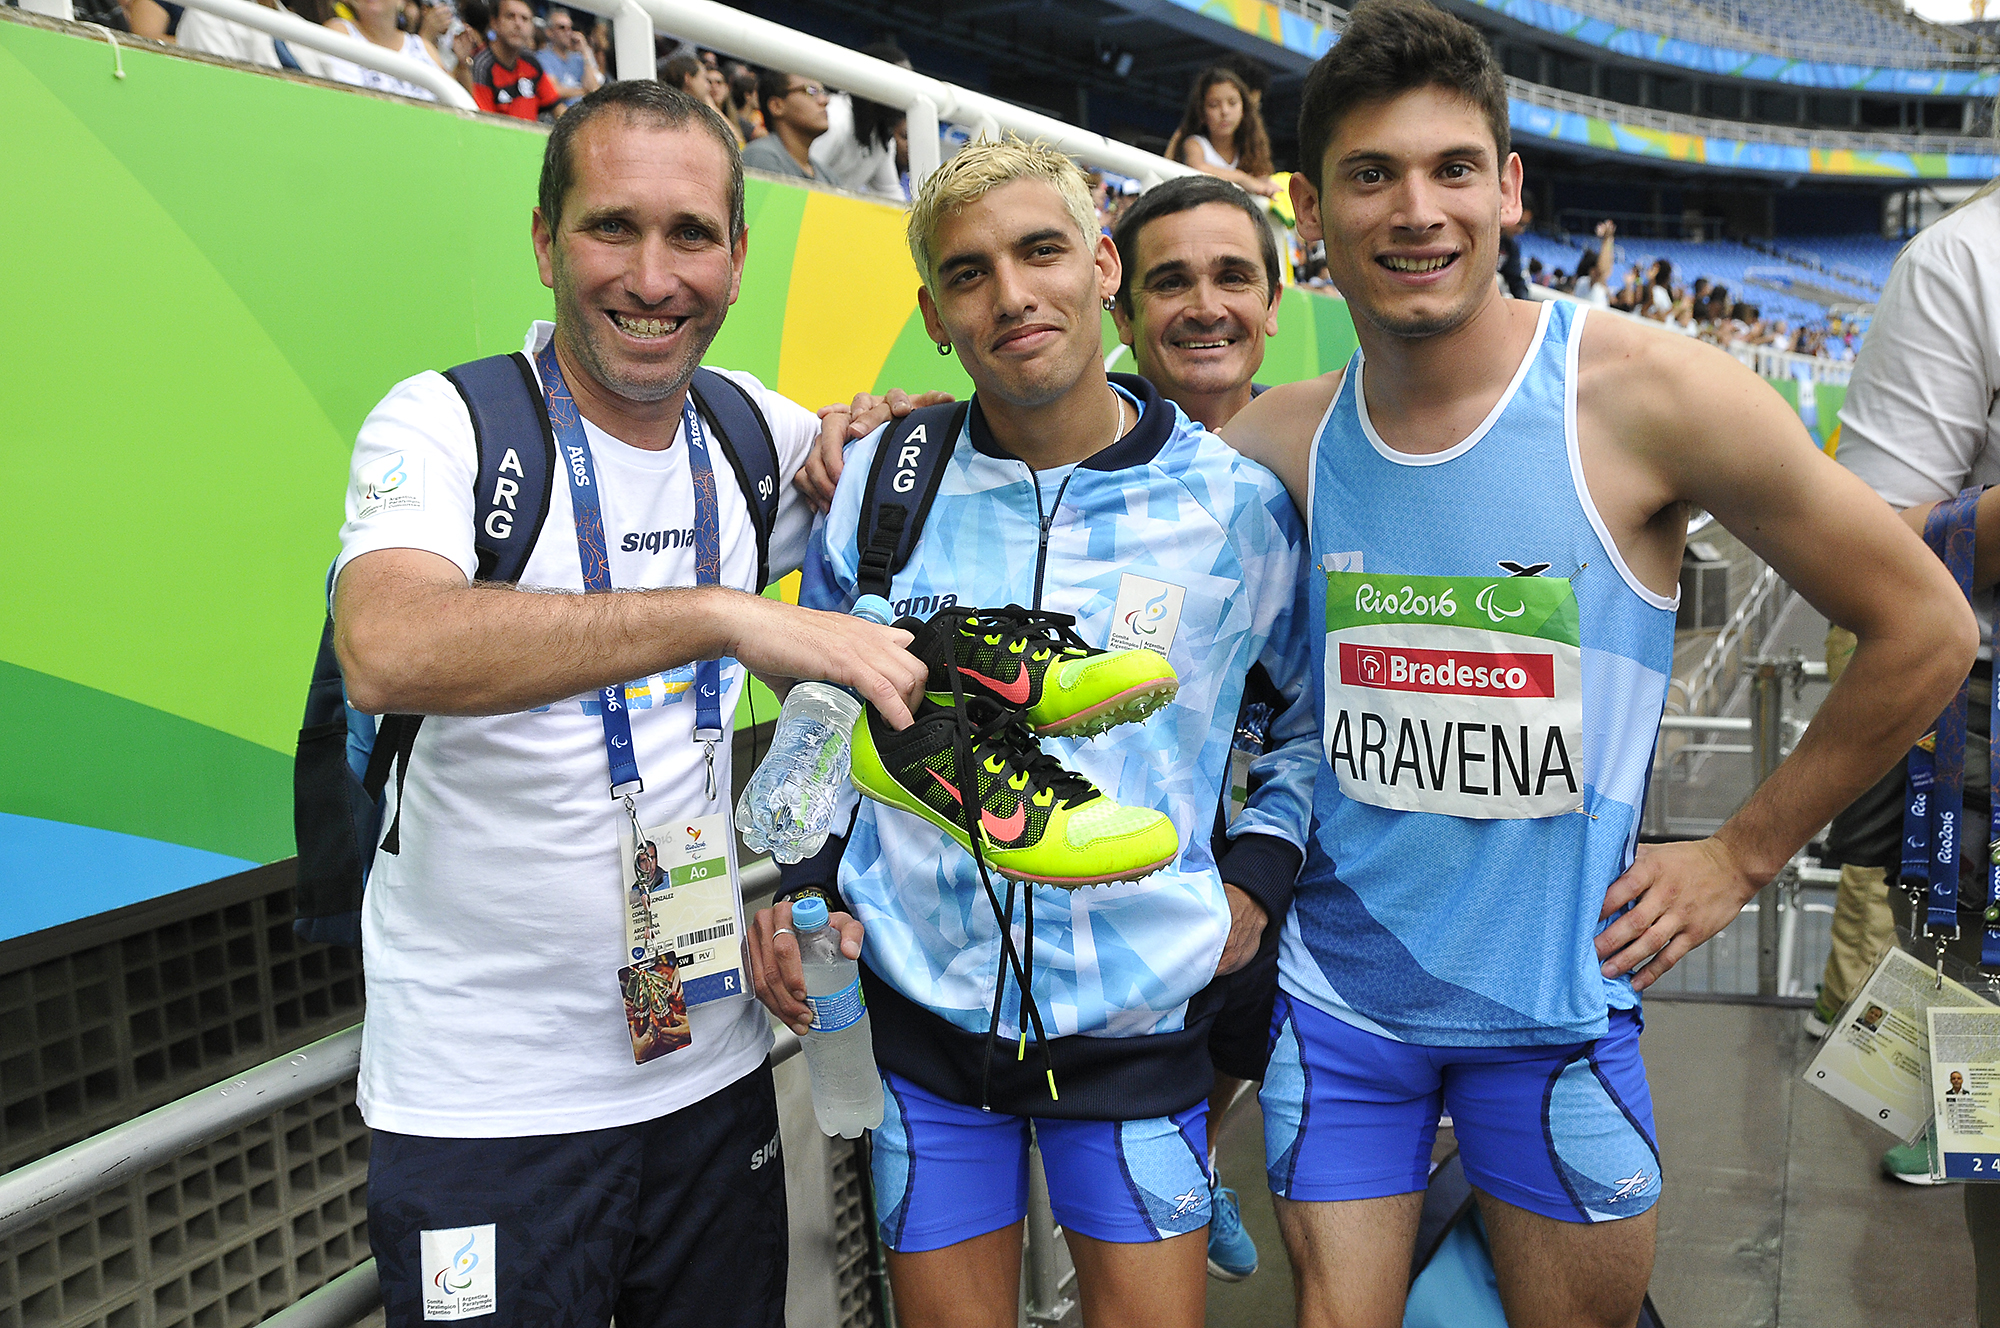 ariel_gonzalez_atletismo